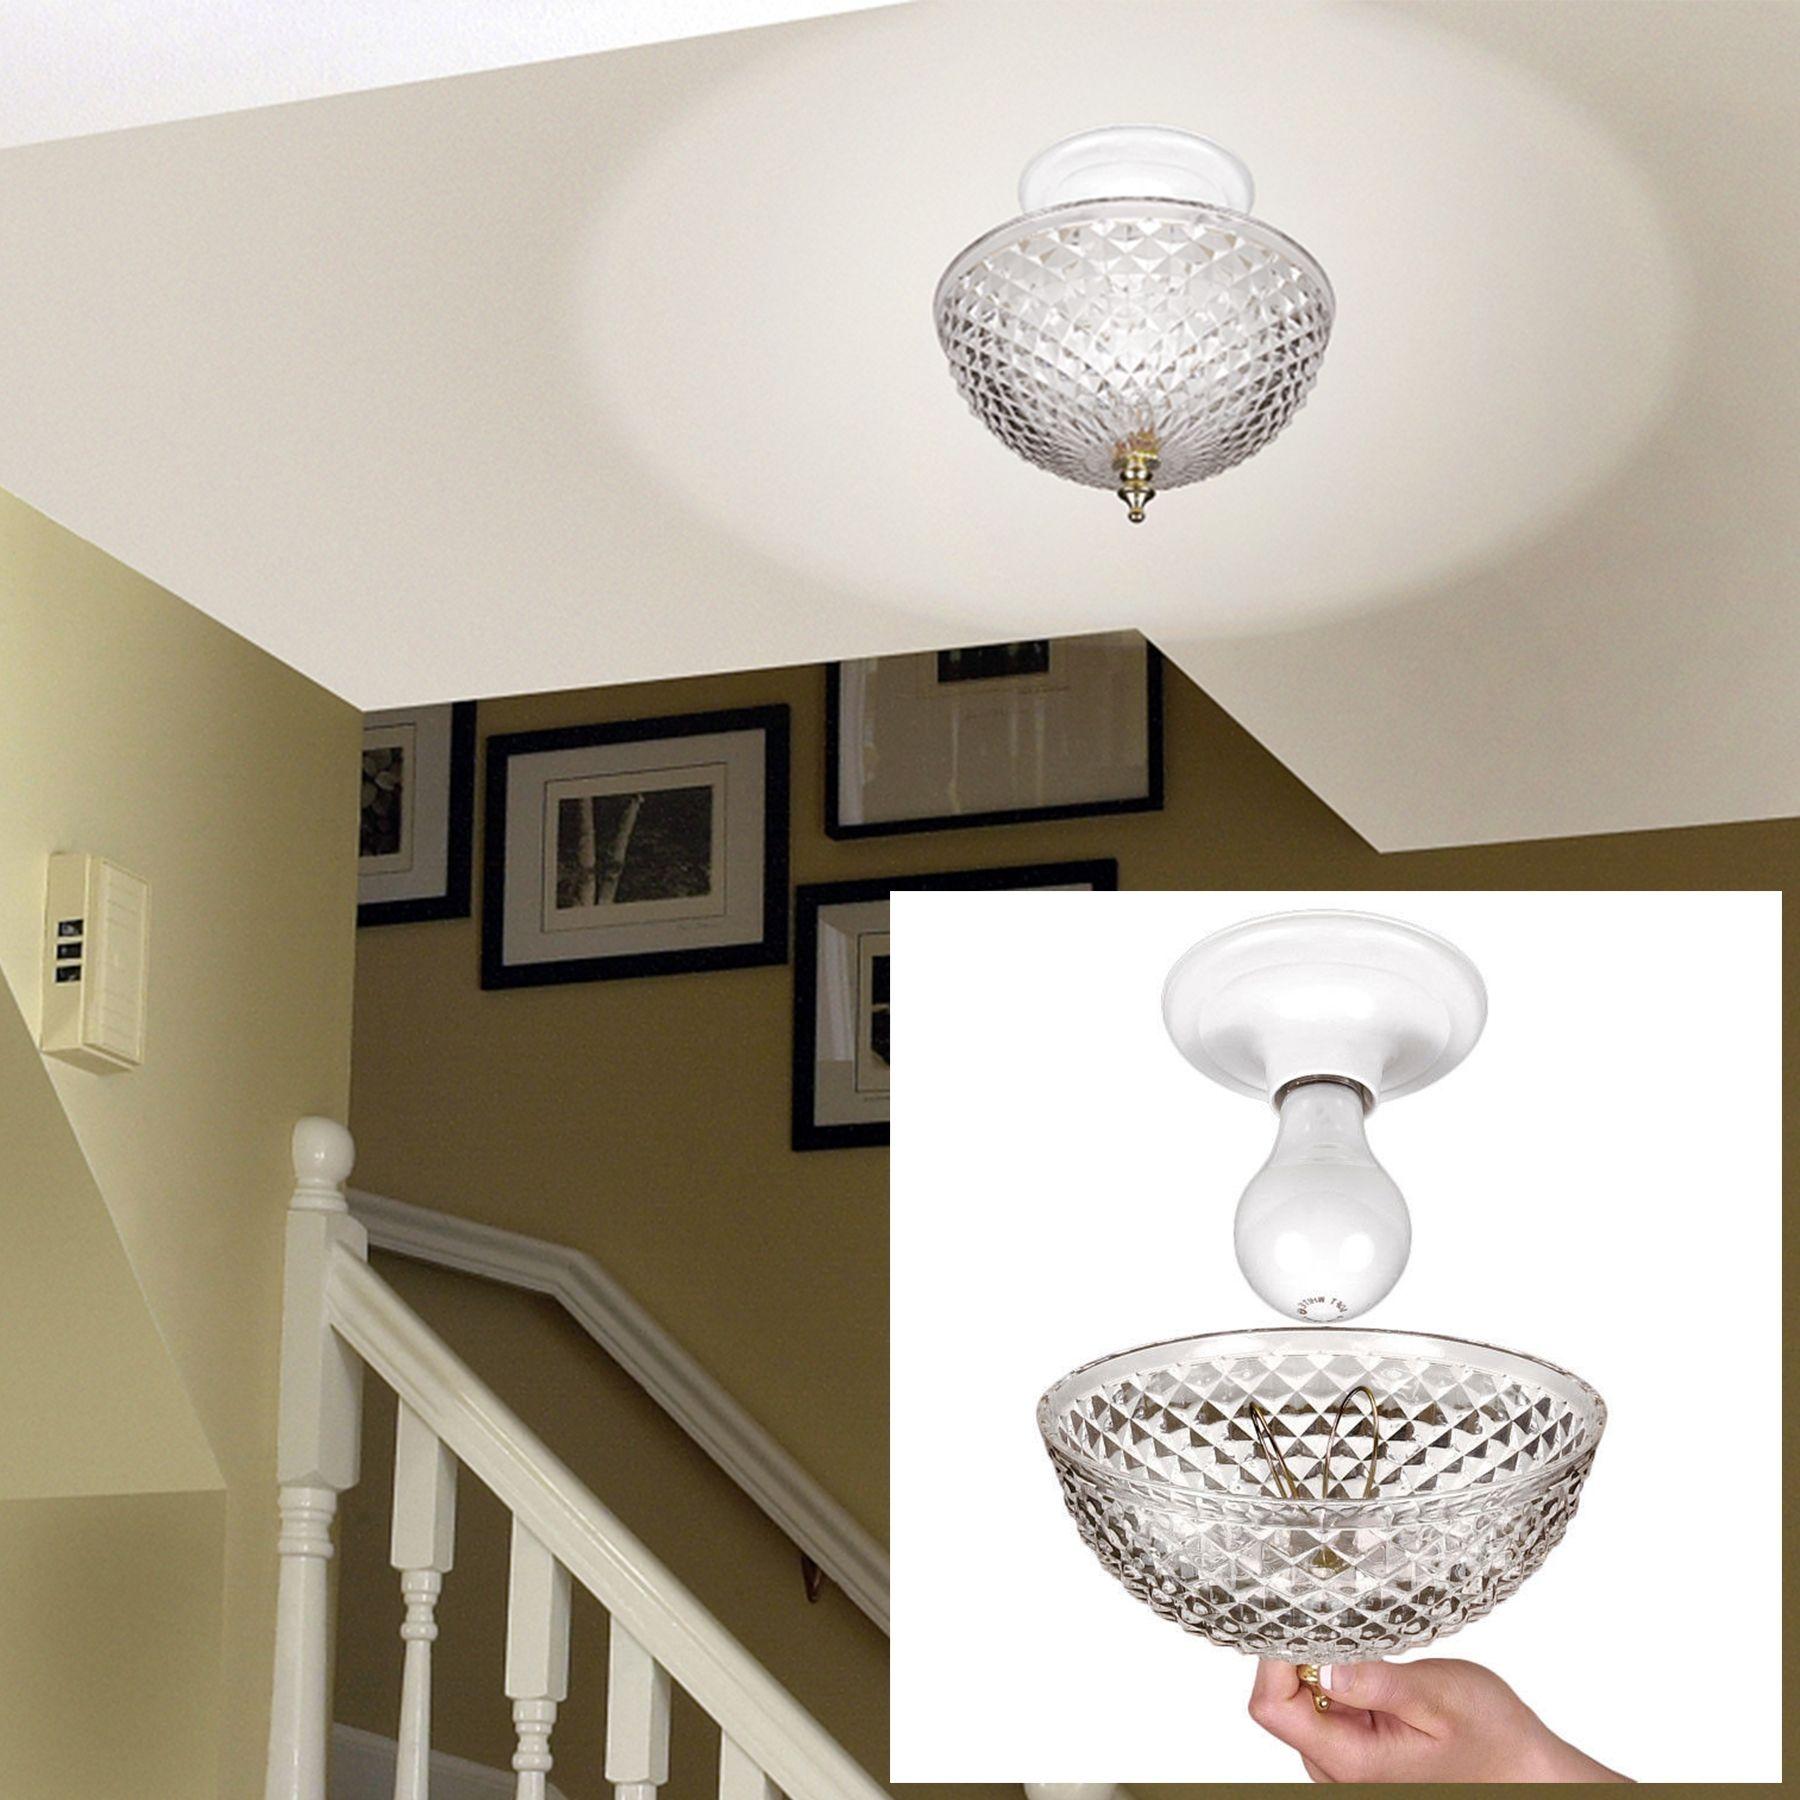 Ceiling Light Bulb Covers Clip